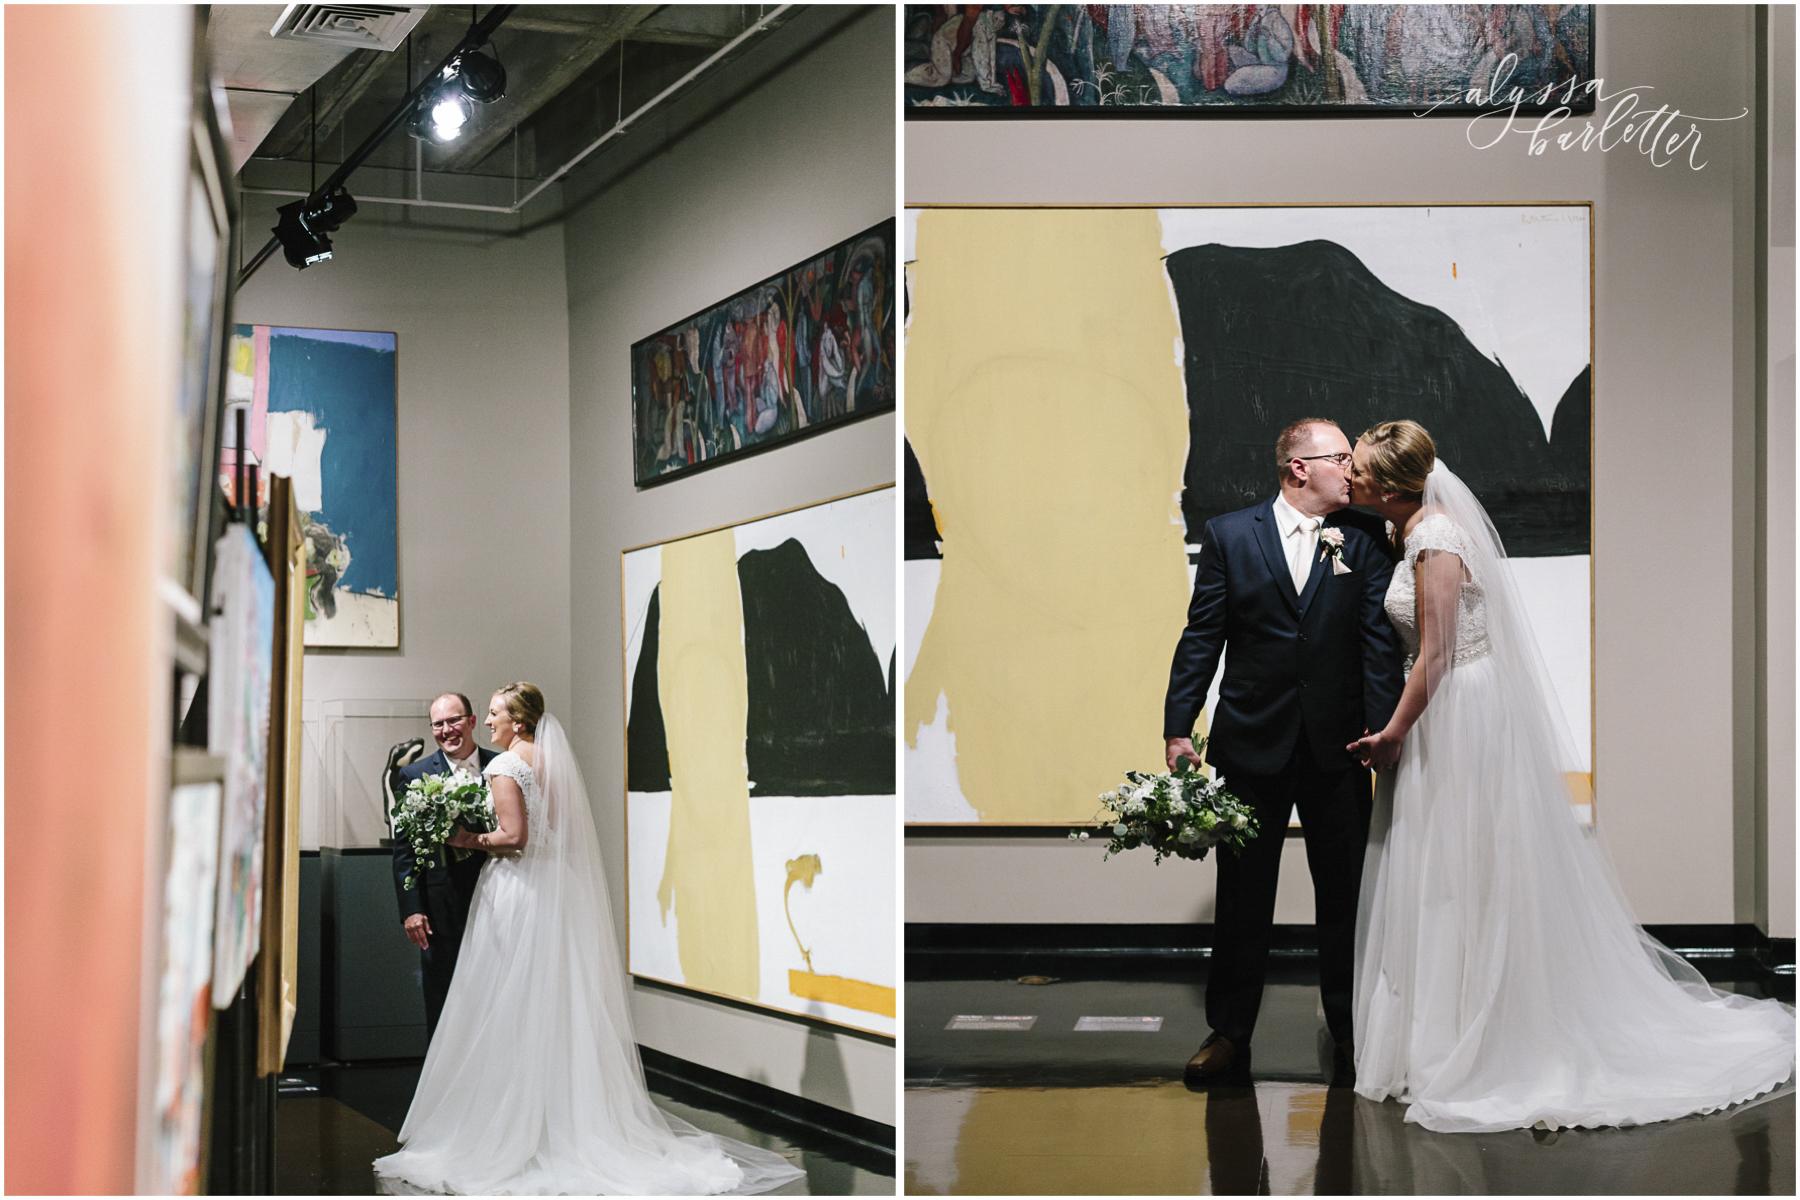 alyssa barletter photography cider gallery lawrence kansas rainy day wedding megan and brett-1-25.jpg